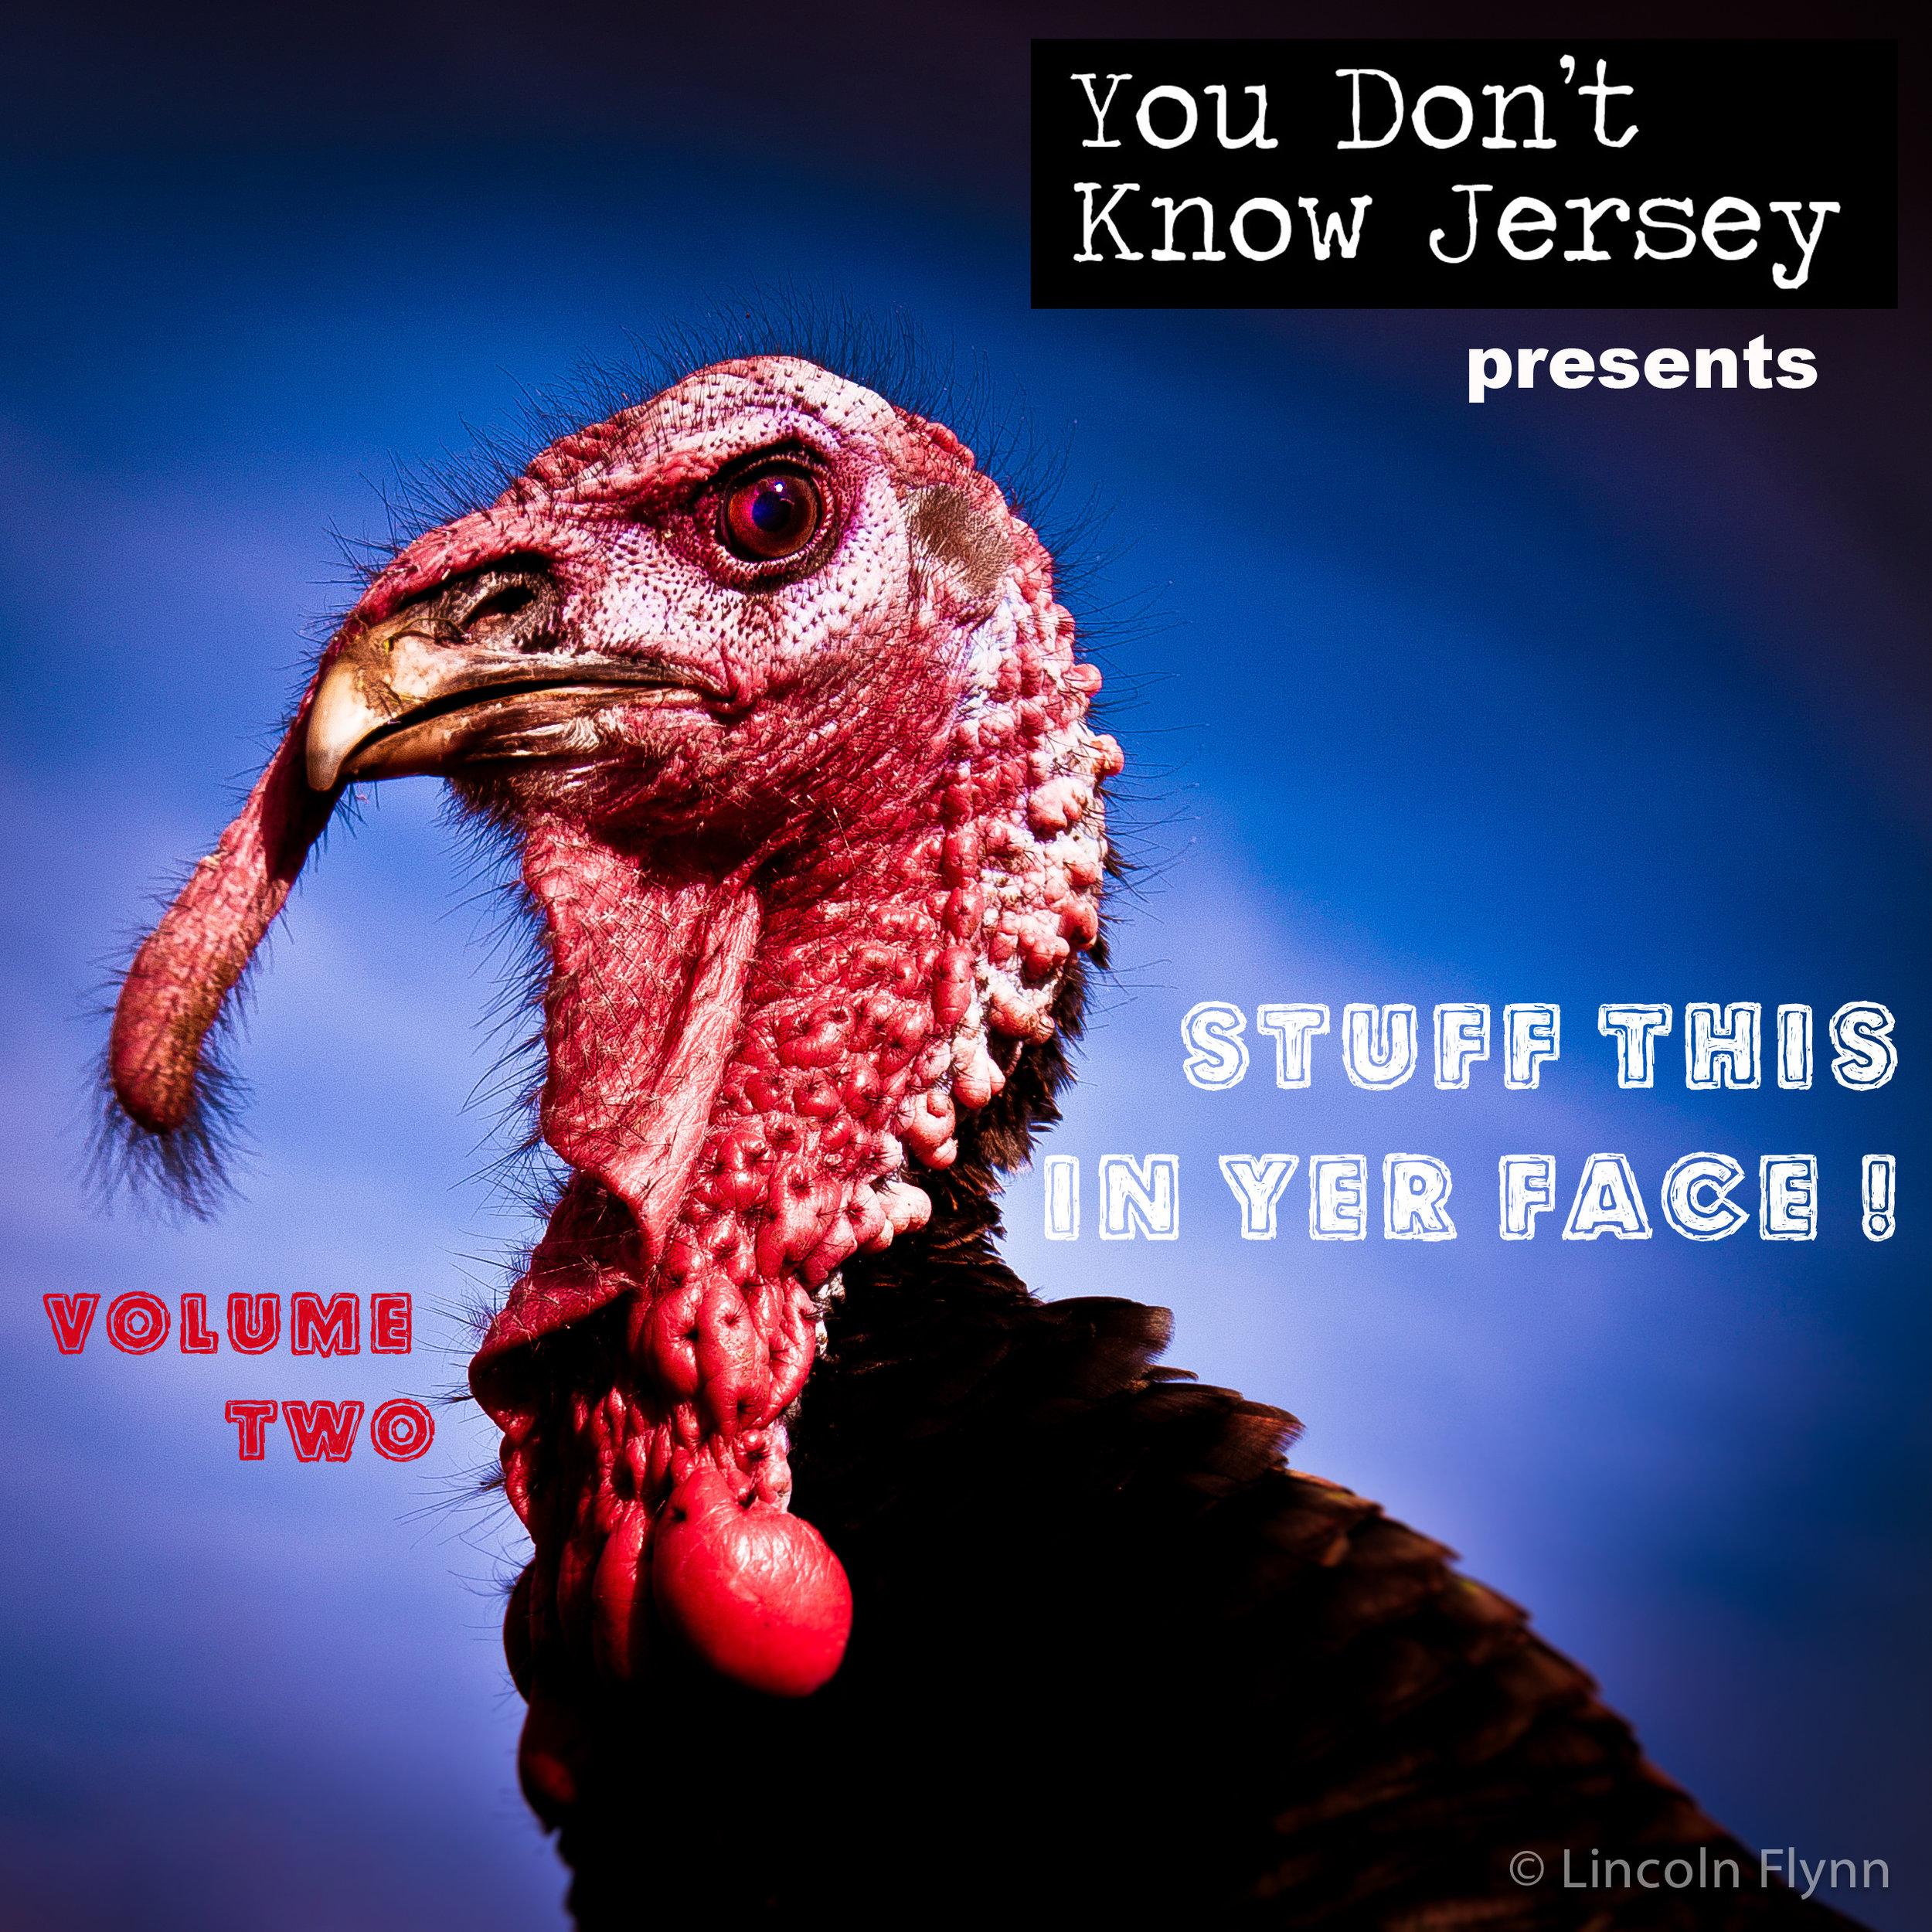 YDKJ Angry Turkey.jpg